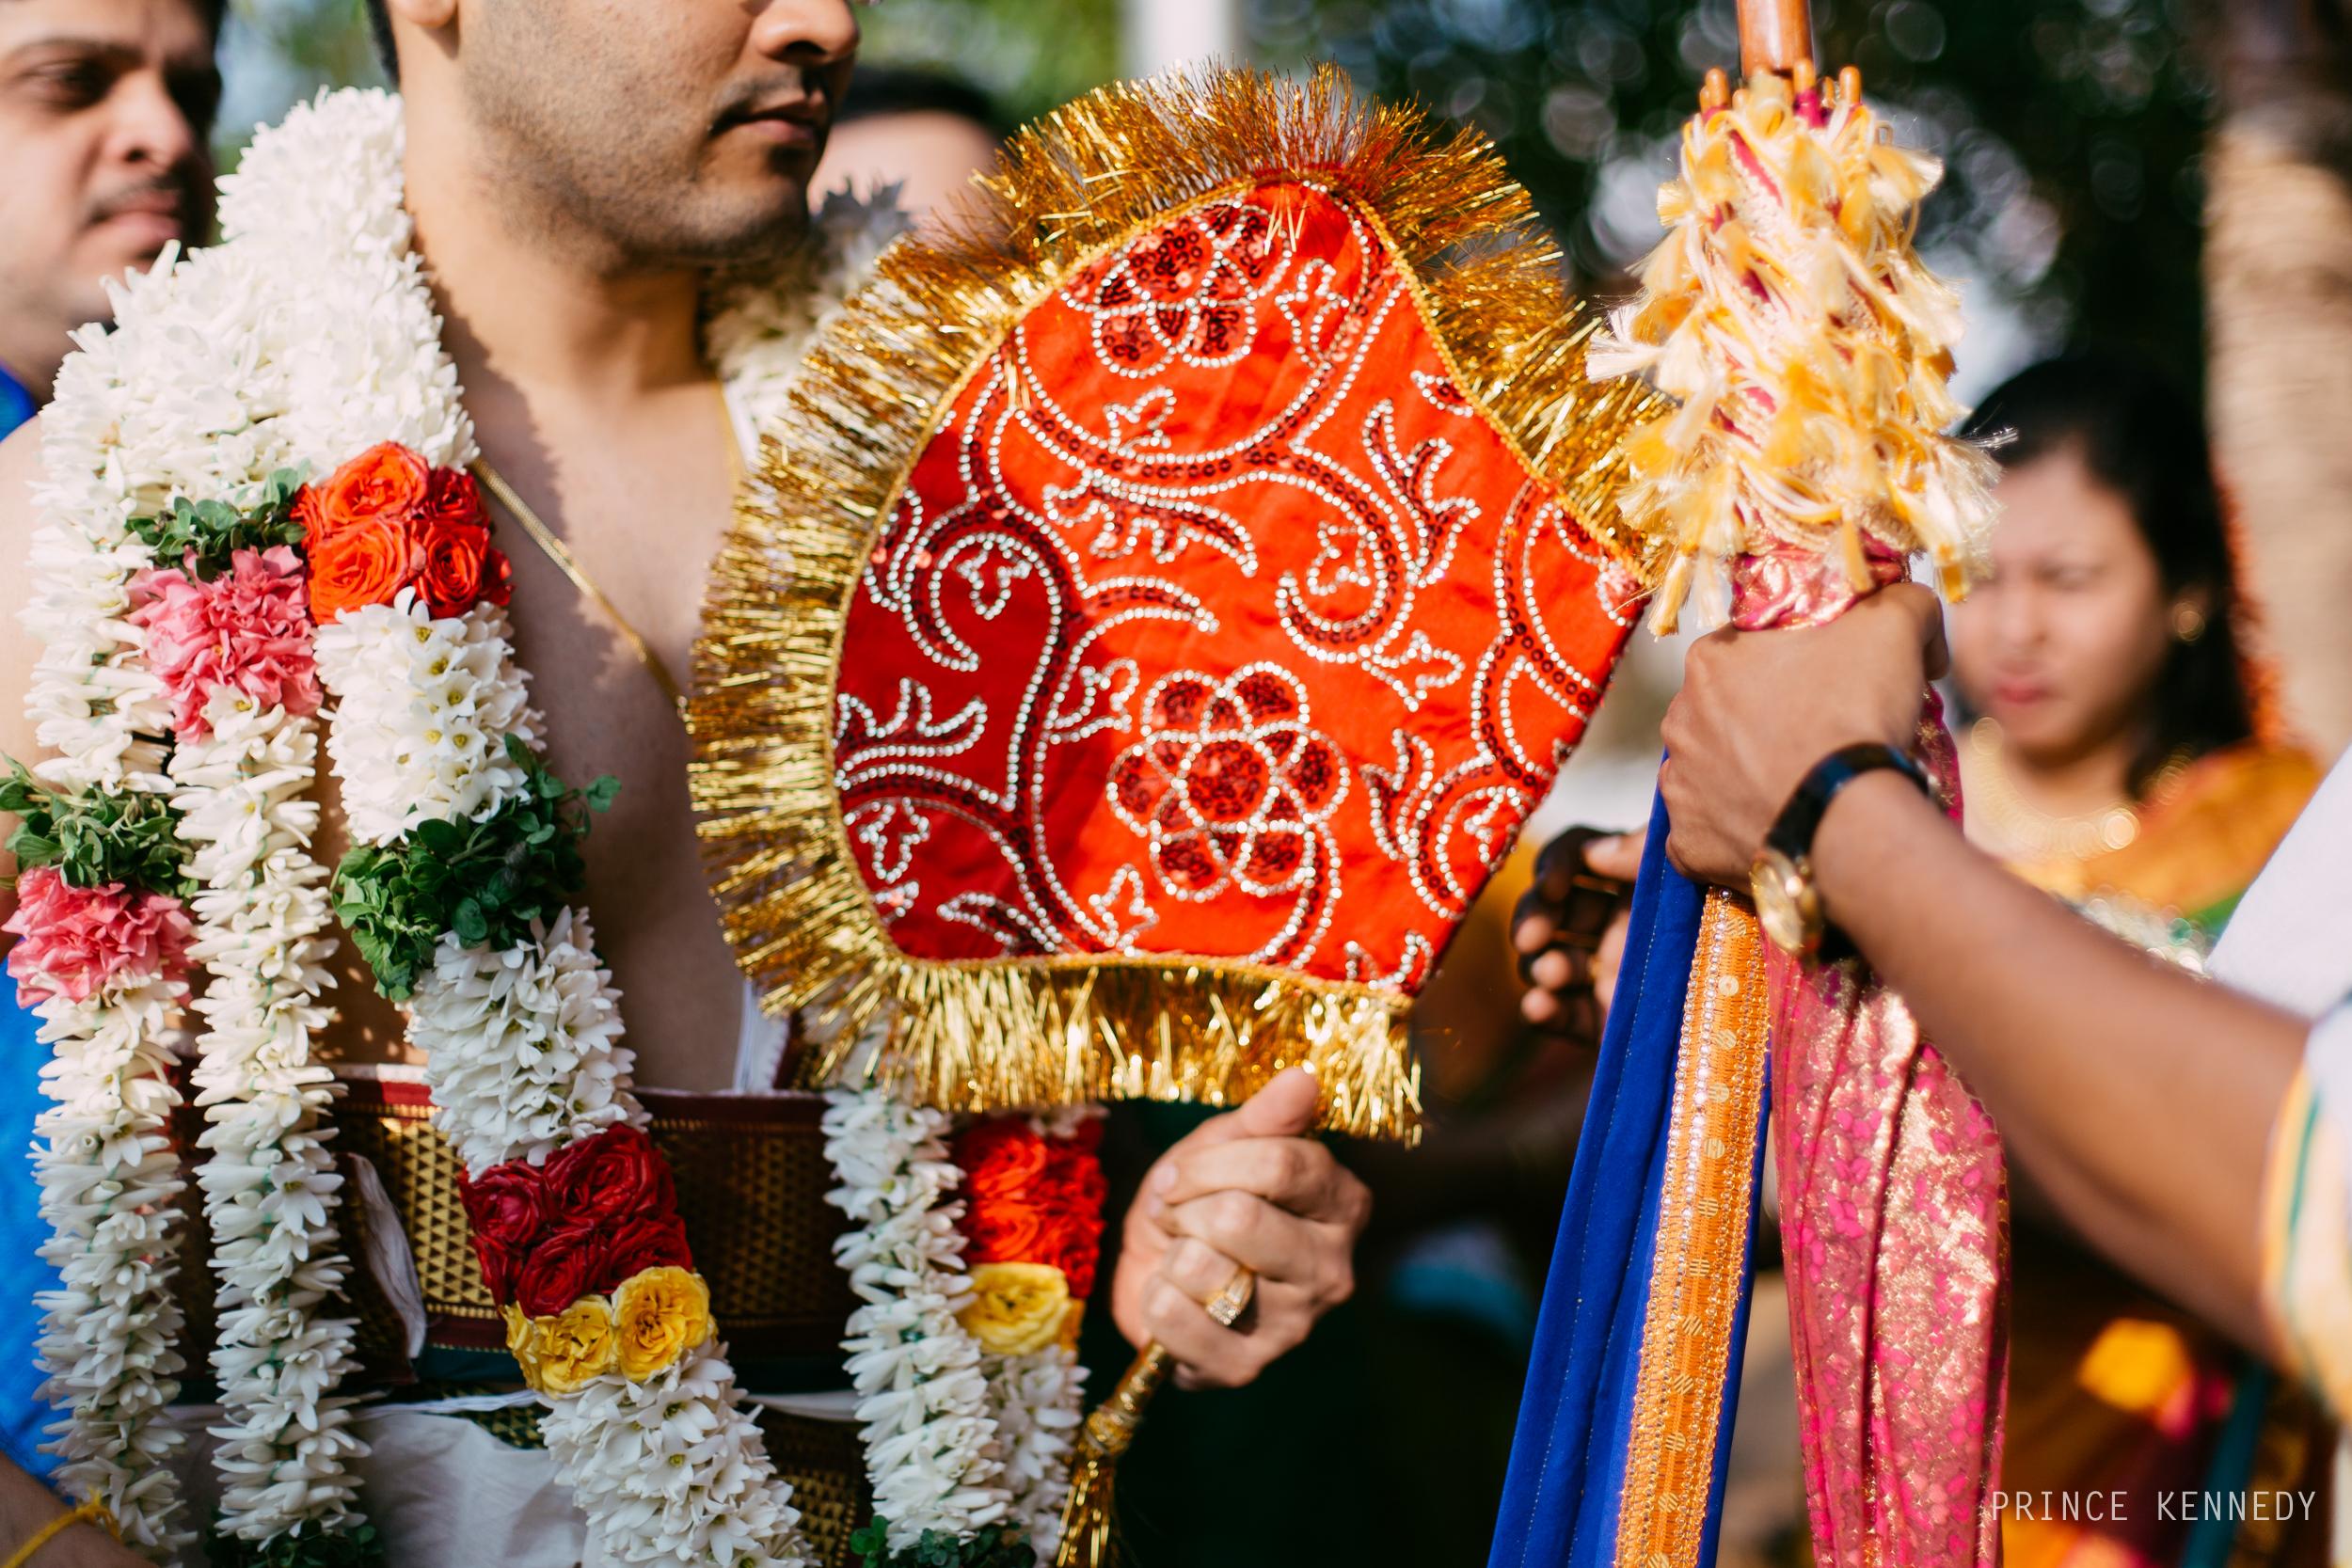 Athmajja-Nithesh-Engagement-Couple-Portrait-Portraiture-Wedding-Couple-Portrait-Chennai-Photographer-Candid-Photography-Destination-Best-Prince-Kennedy-Photography-41.jpg